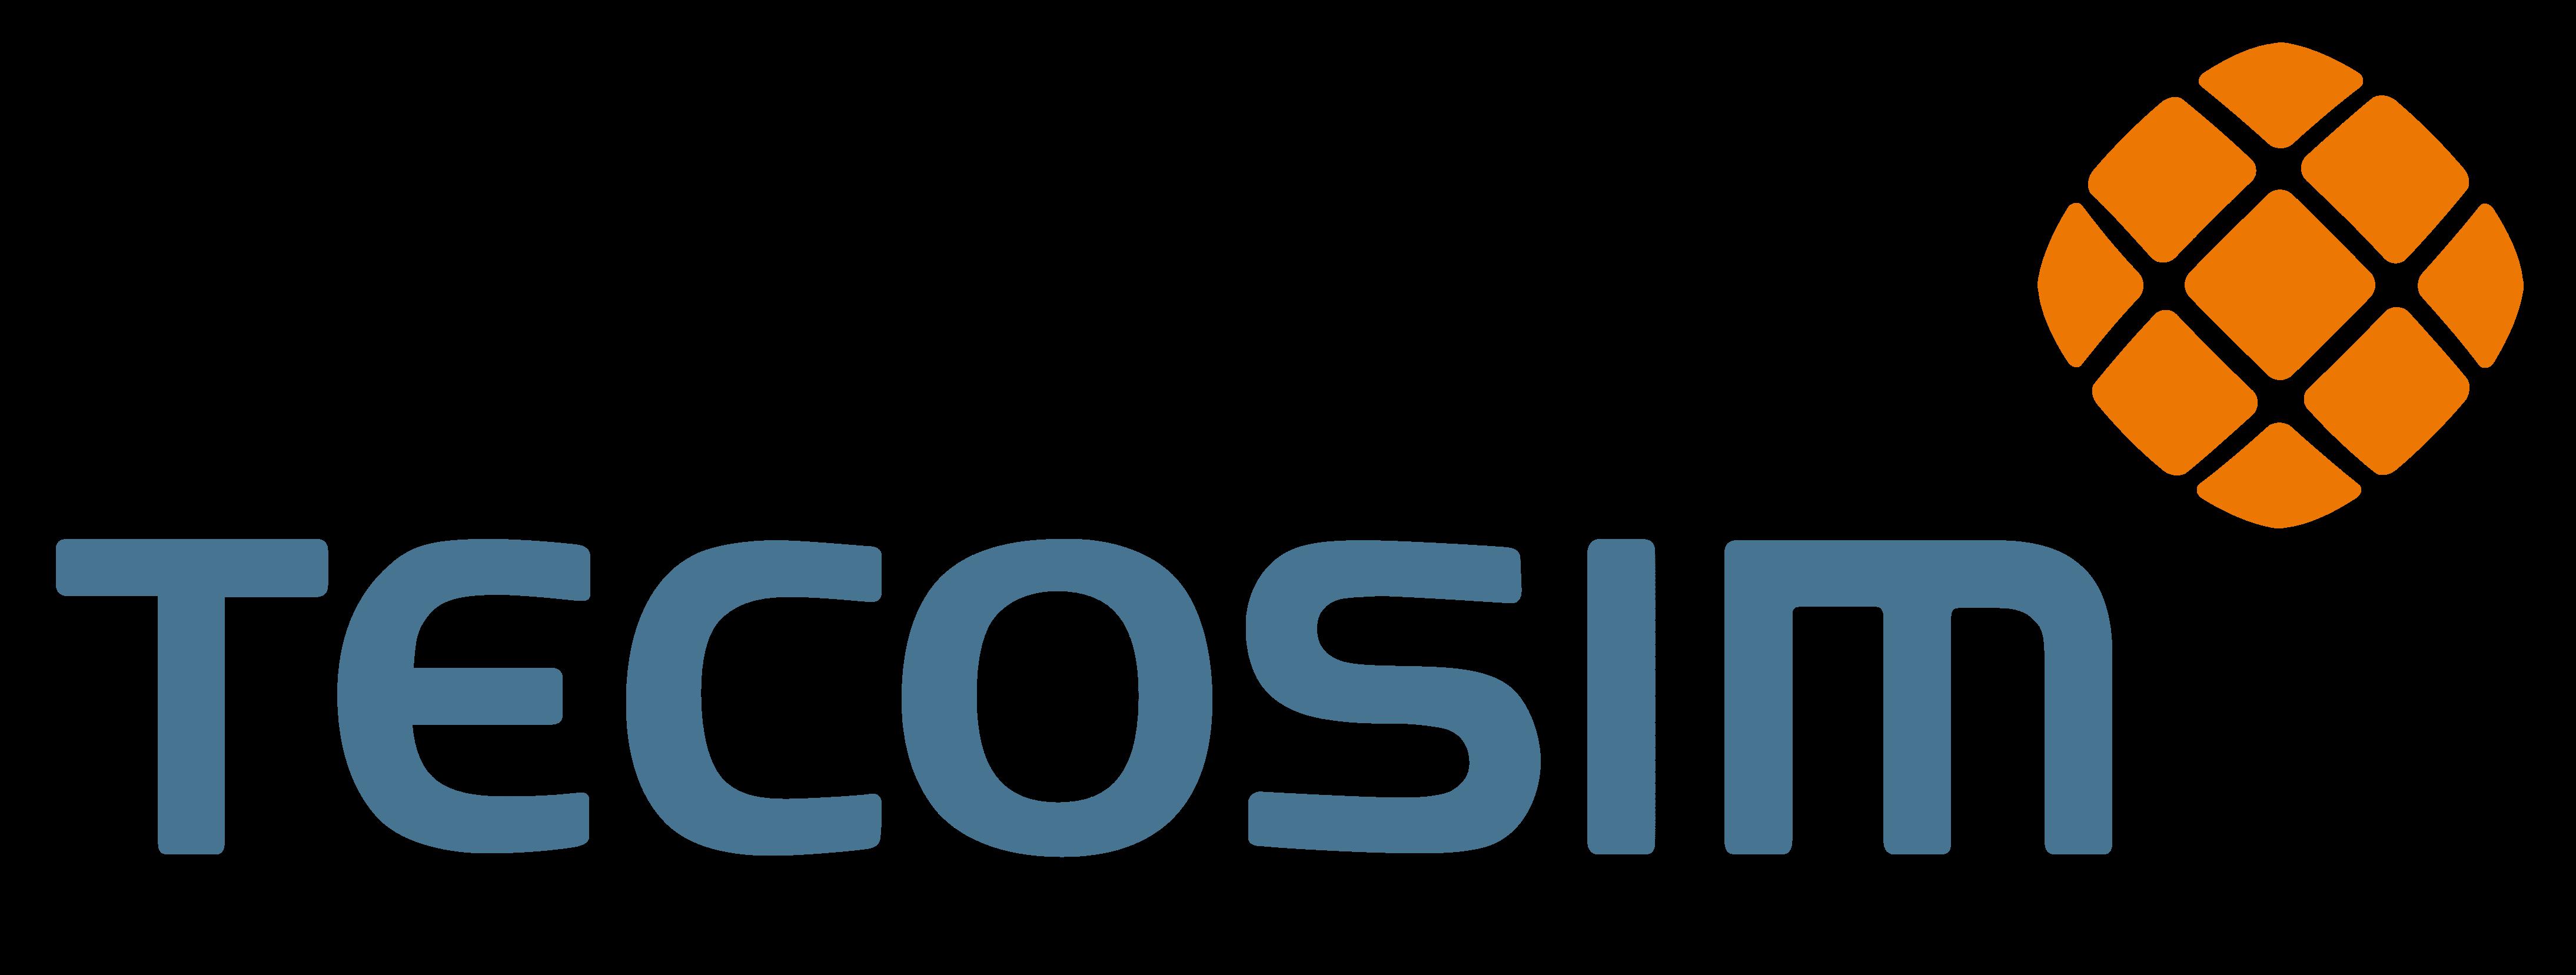 TECOSIM Medical technology – Logos Download  TECOSIM Medical...